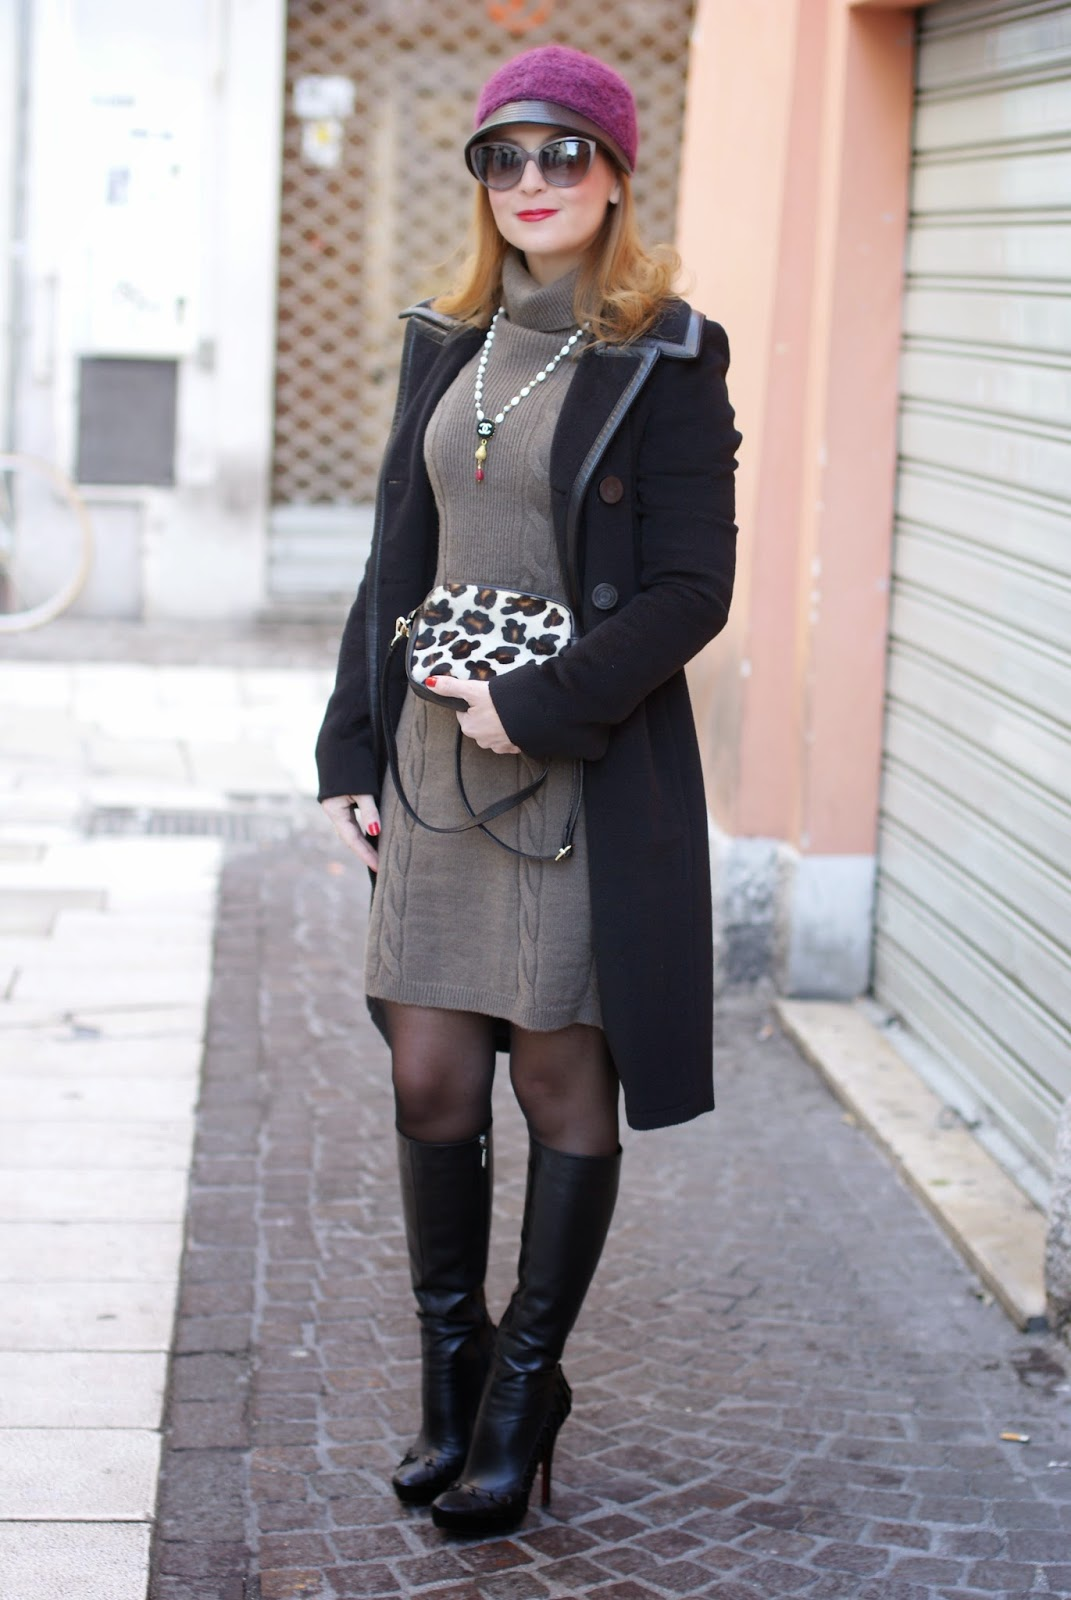 Balenciaga black coat, jockey hat, fetish boots, Sofia borse Candy pochette, Fashion and Cookies, fashion blogger